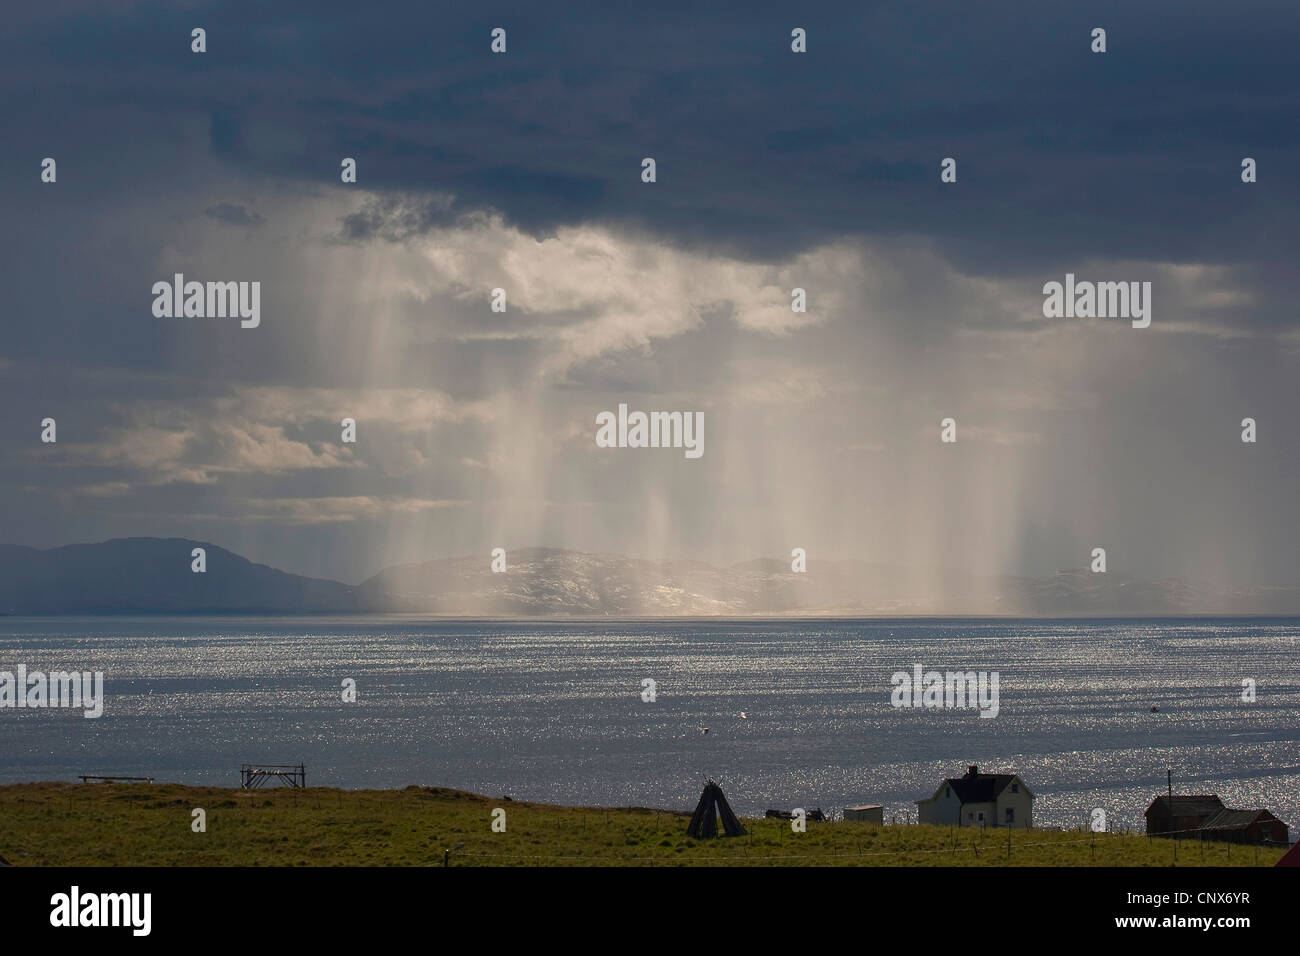 rain over the sea, Norway, Norway, Varanger Peninsula, Ekkeroy - Stock Image